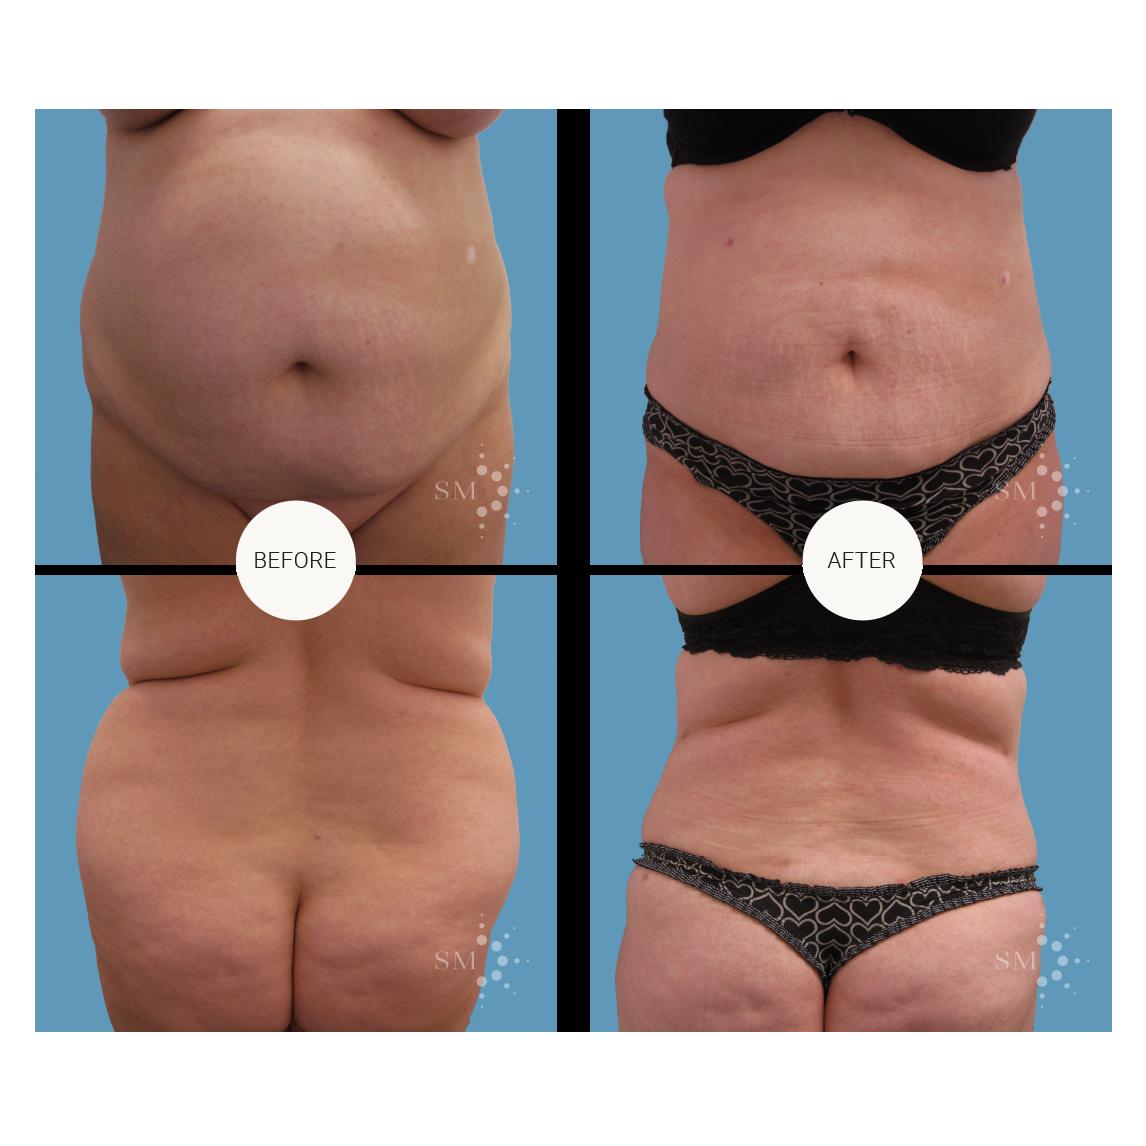 Liposuction - An Evolving Science but still an Imprecise